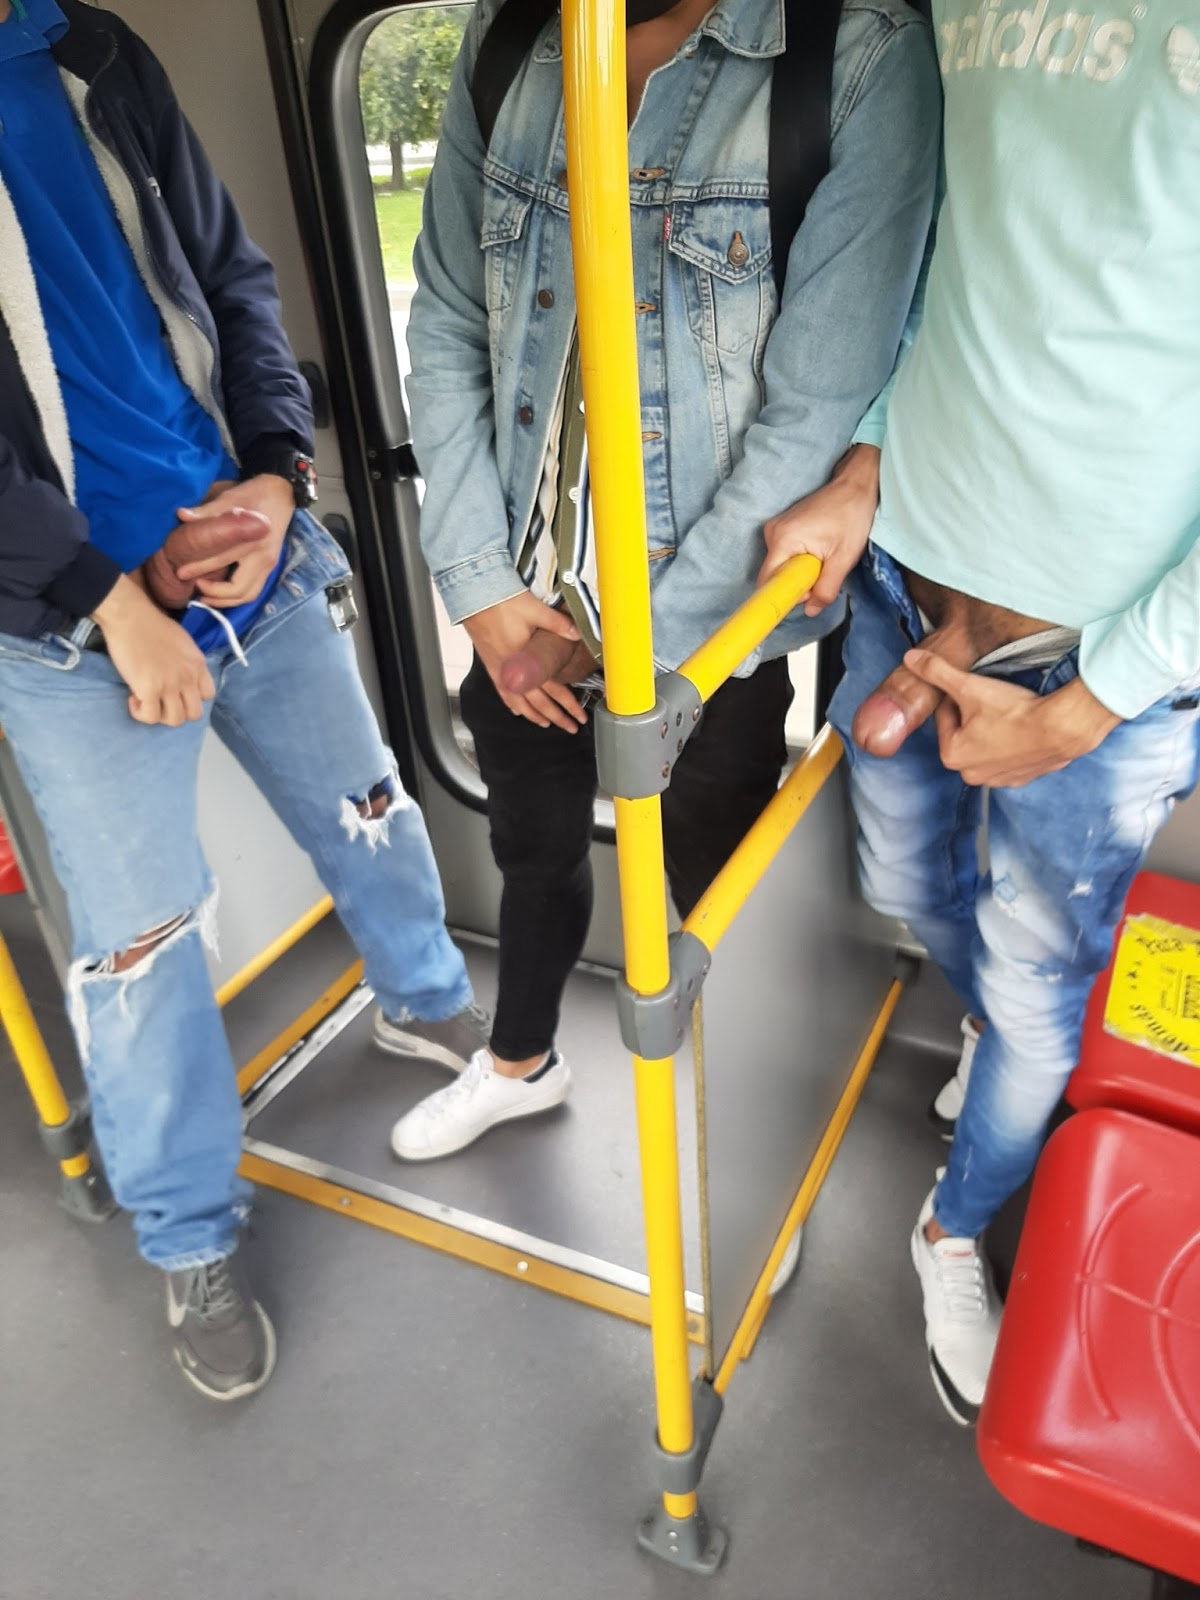 pene en transporte publico, se lo saca